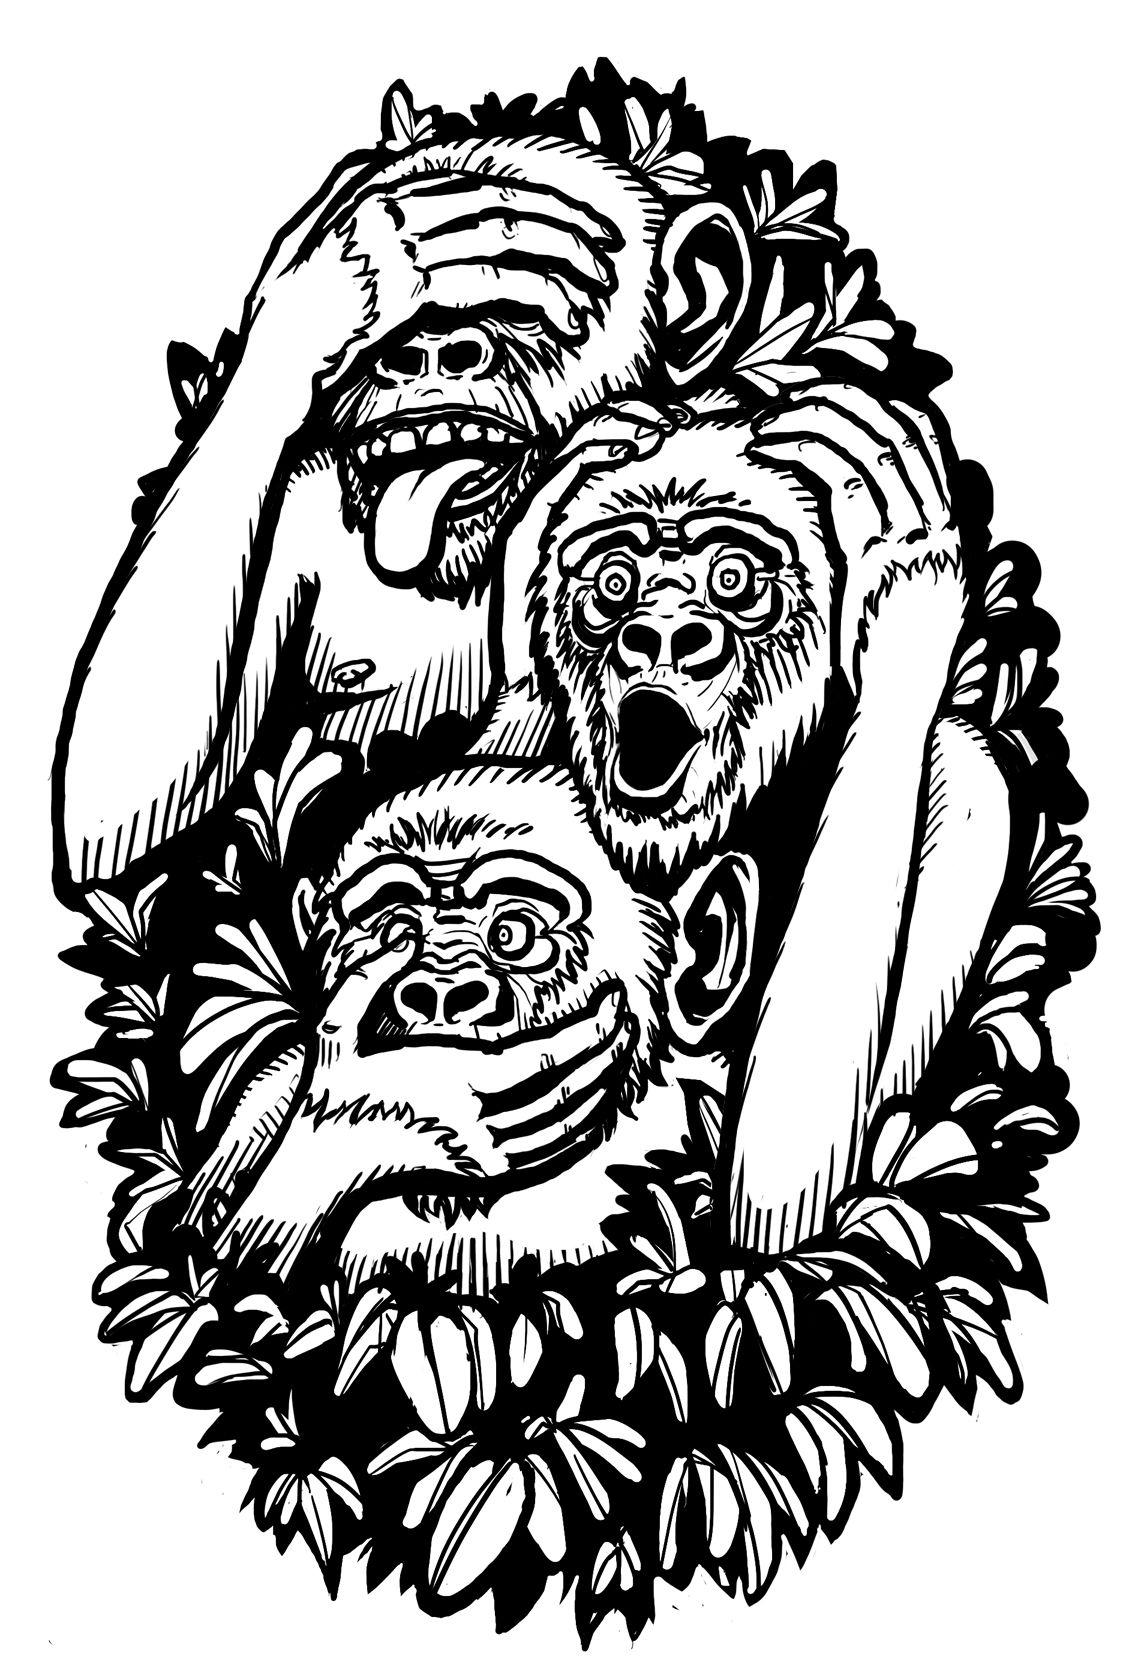 3 Monos Sabios Tatuajes diseño del tatuaje de tres monos sabios   tres monos sabios